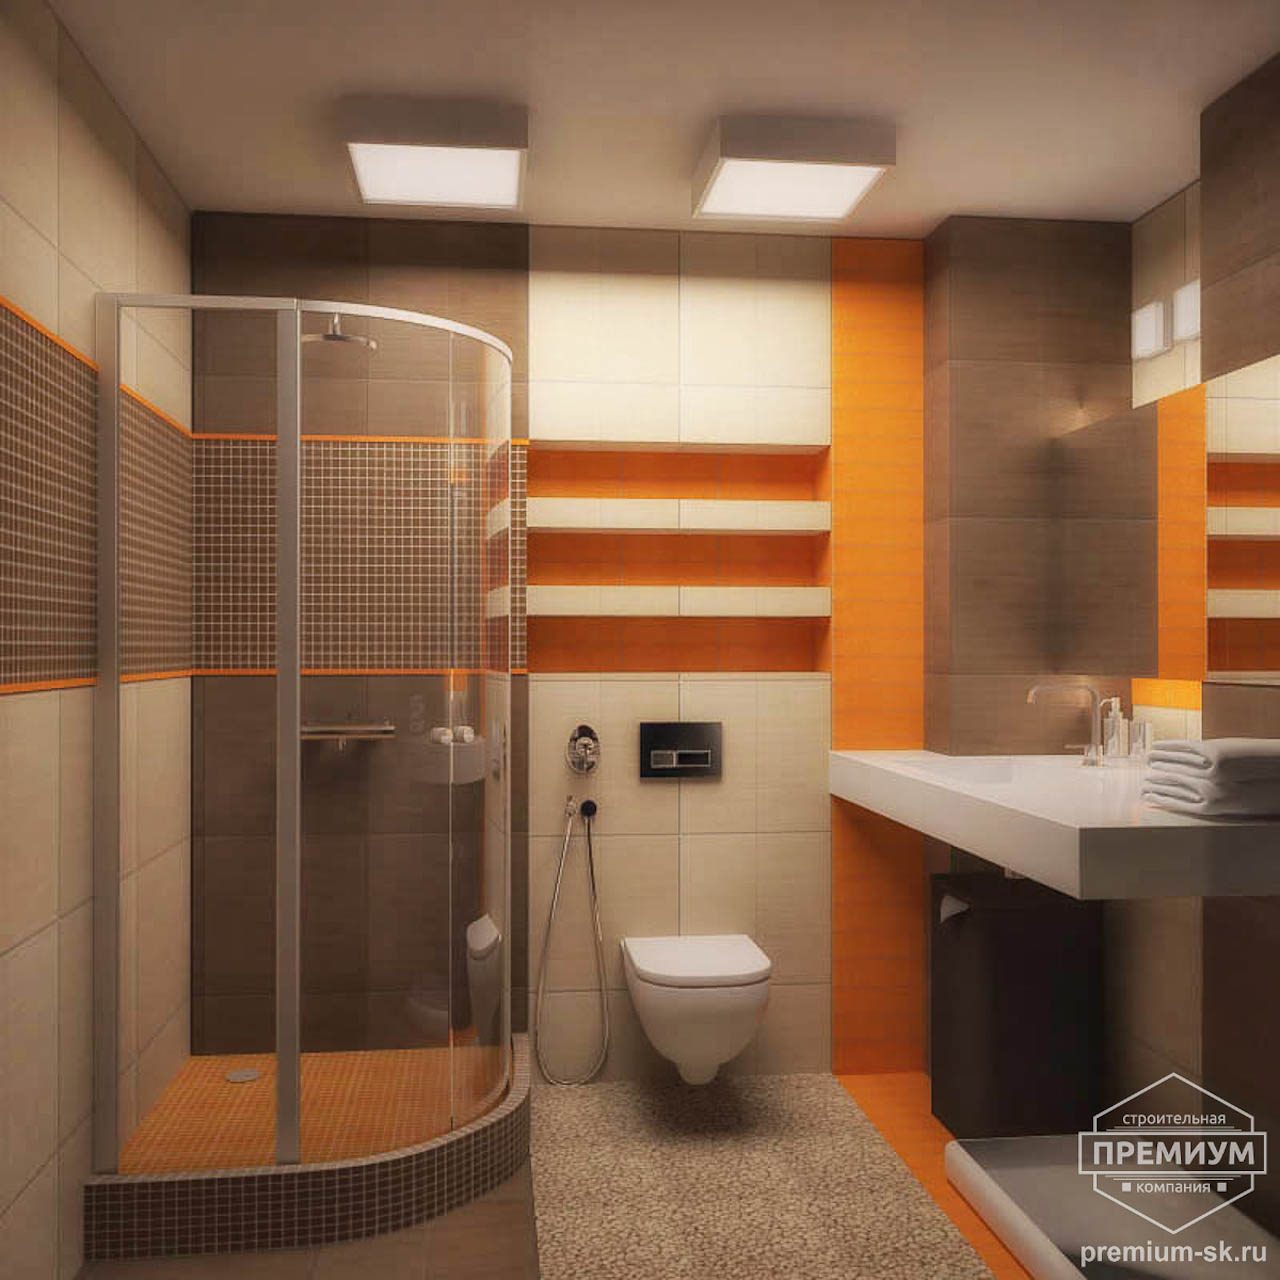 Дизайн интерьера однокомнатной квартиры по ул. Сыромолотова 11 img1687240319